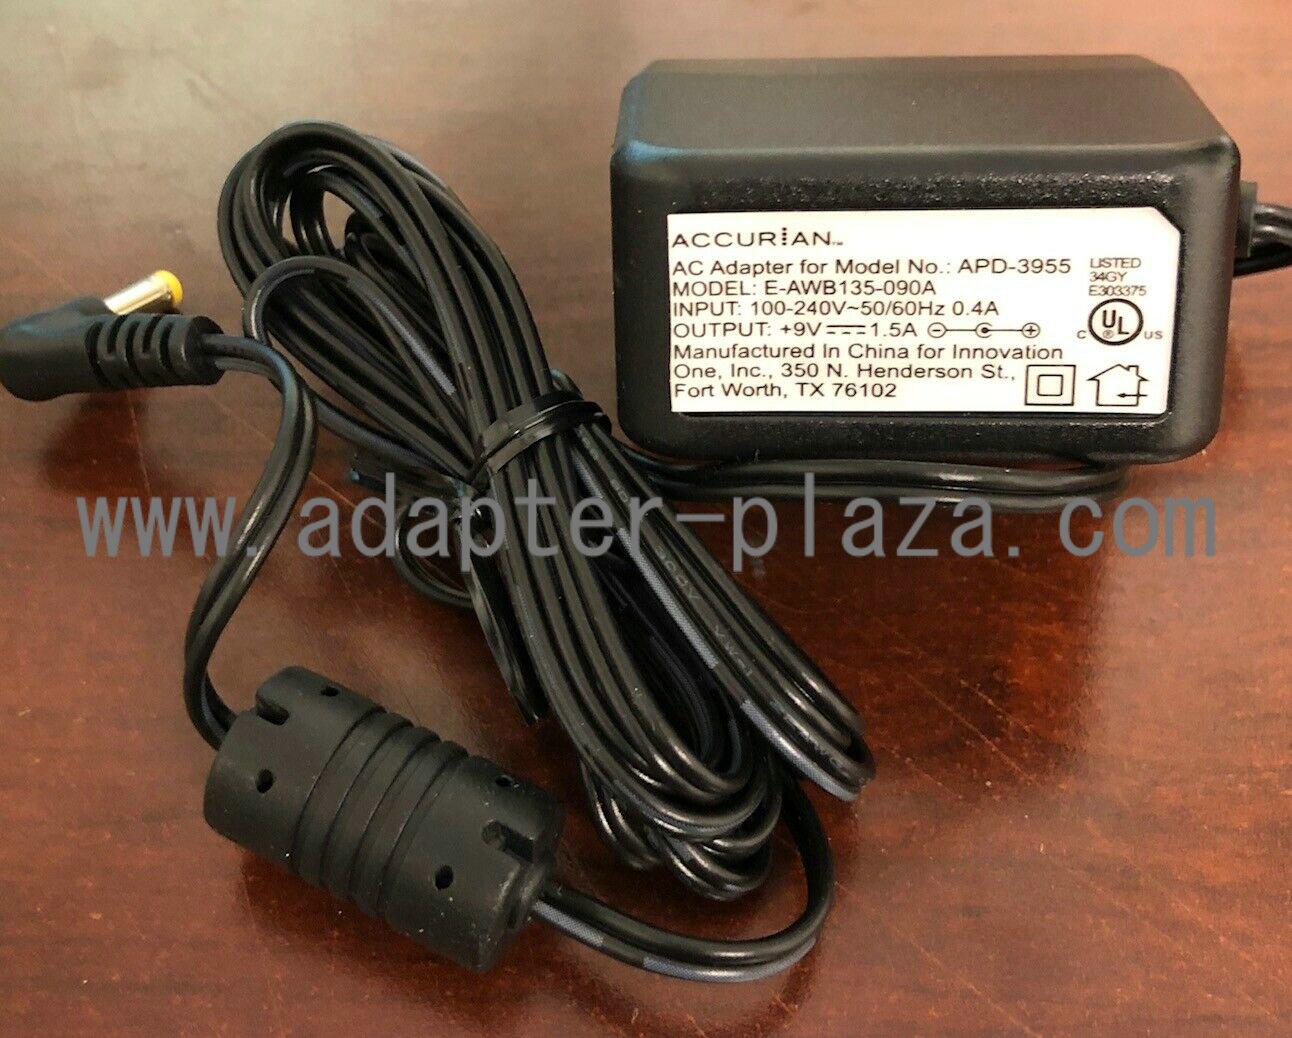 Generic AC Adapter Charger for Kodak ESP 5210 All-In-One Inkjet Printer Power